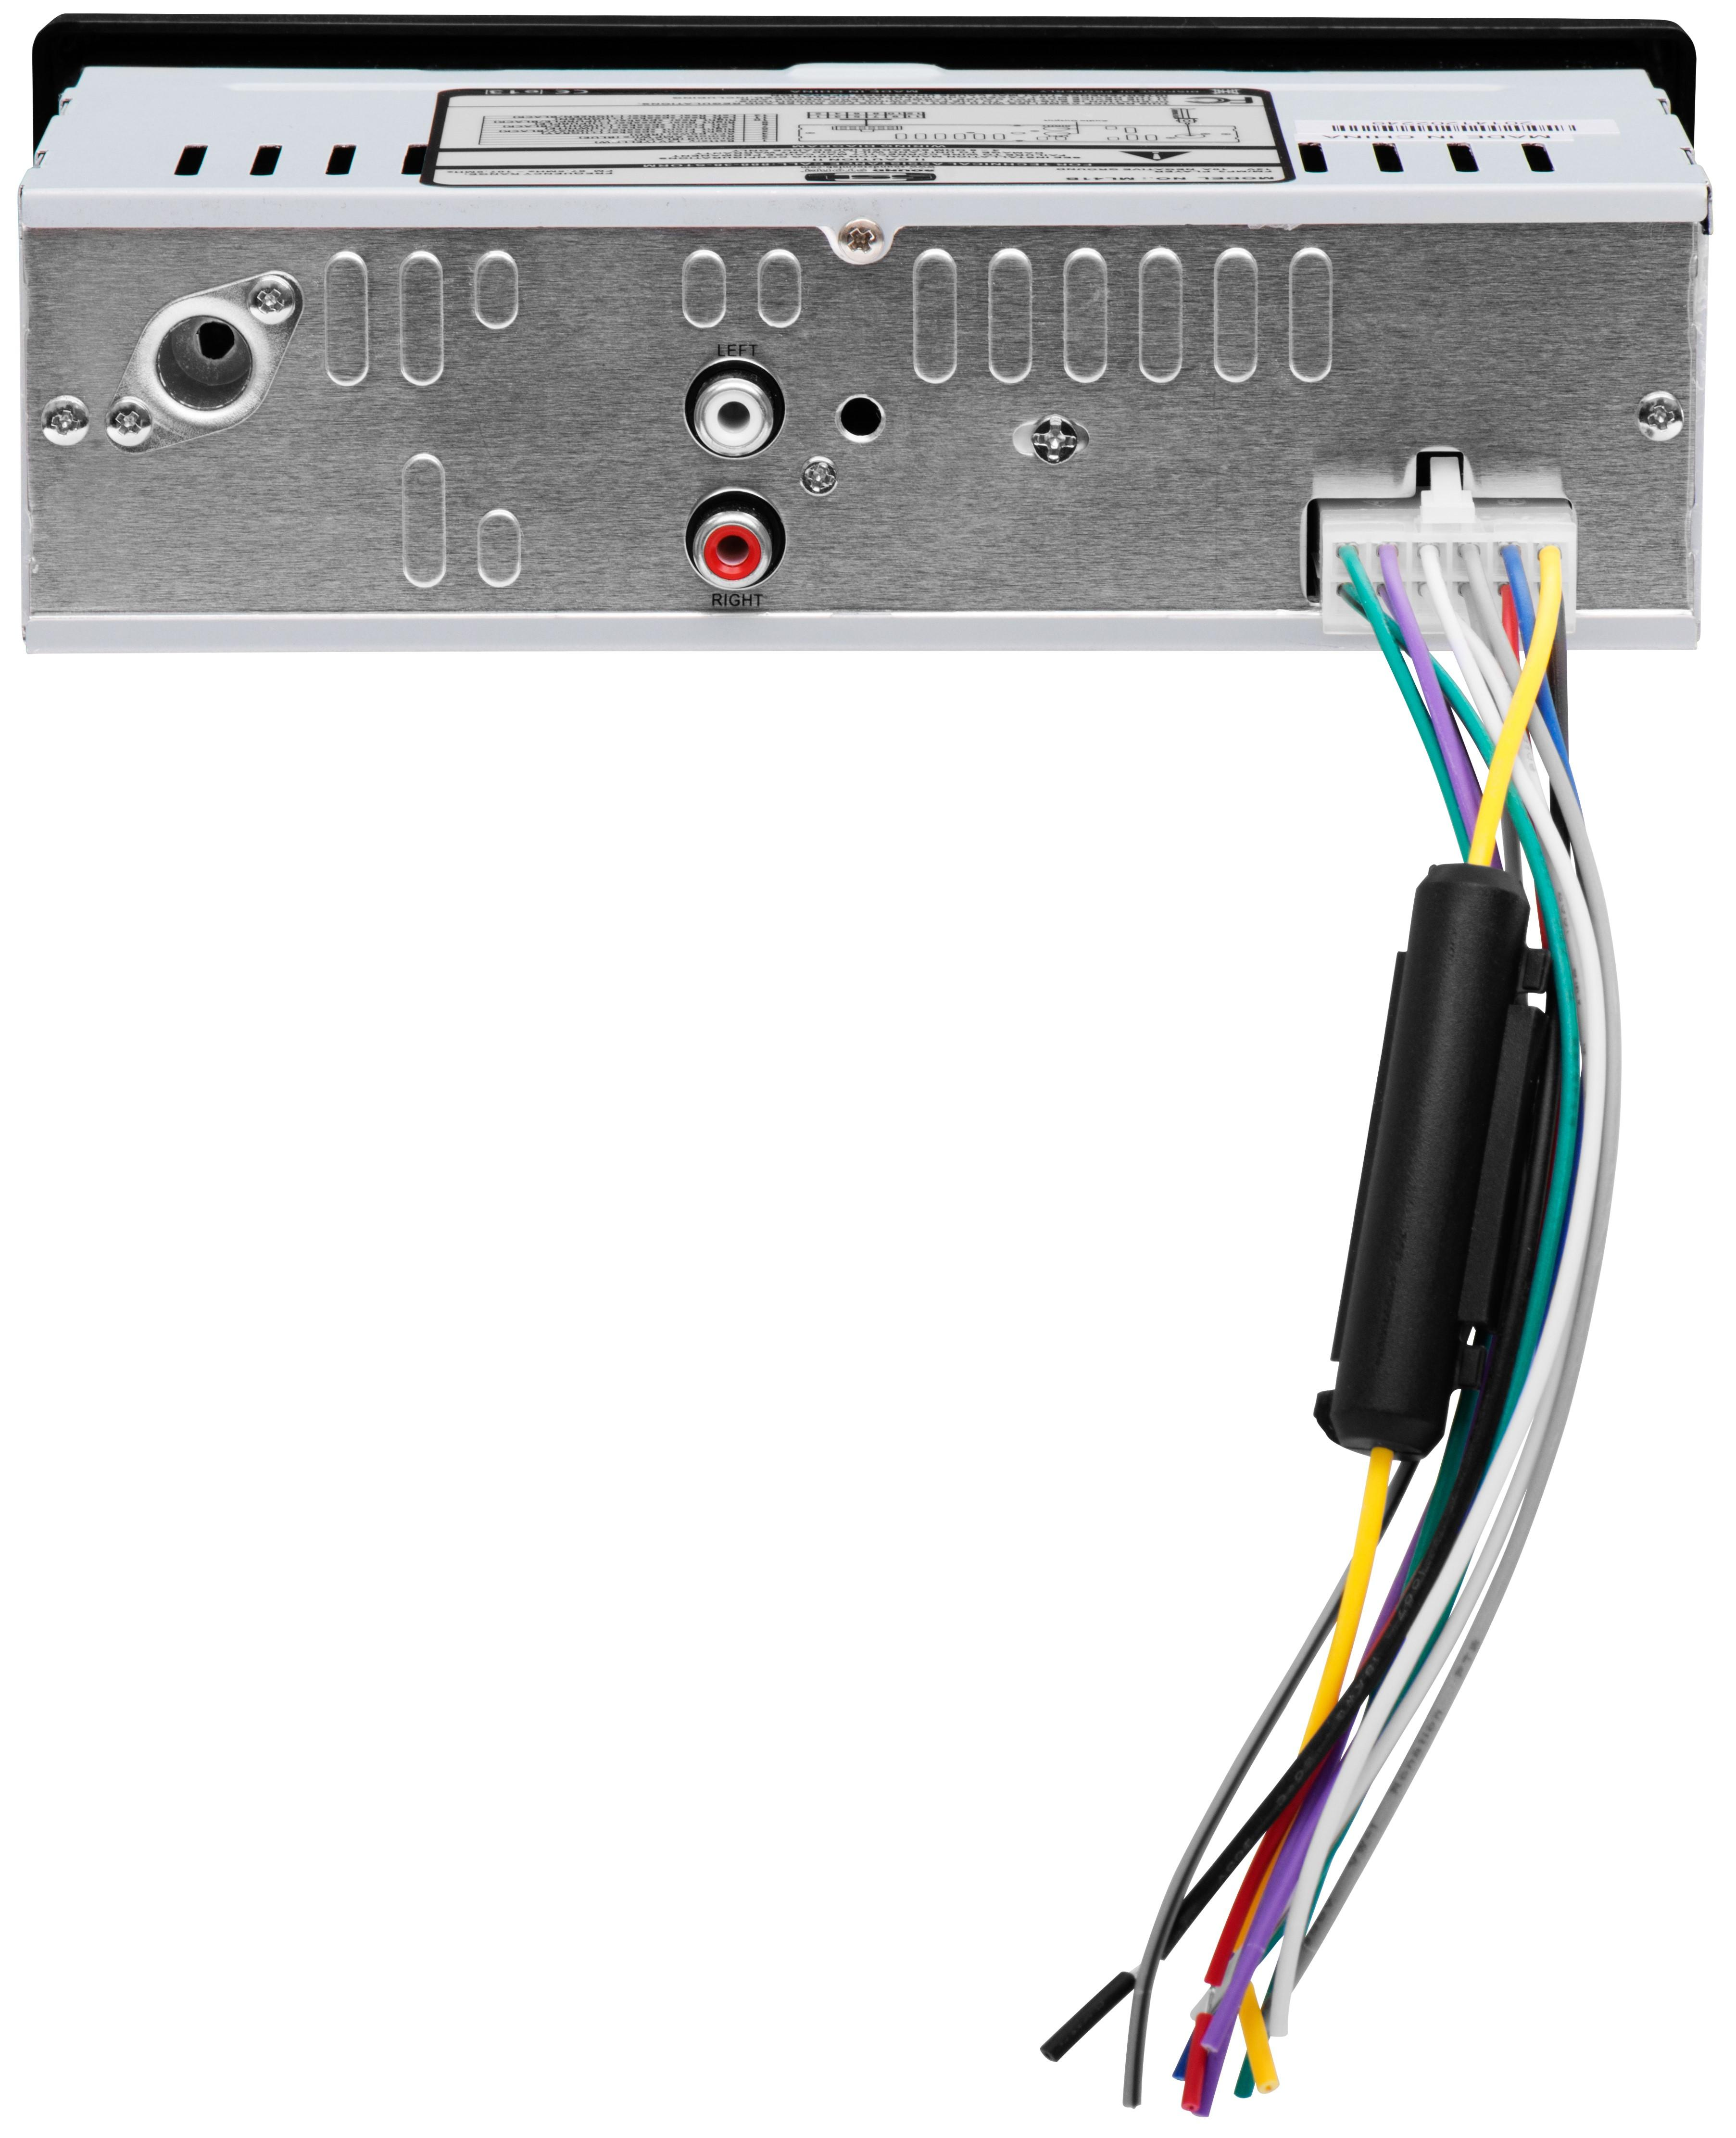 xo vision harness circuit diagram symbols \u2022 code alarm wiring diagram old fashioned xo vision xd103 wiring harness illustration best rh oursweetbakeshop info xo vision wiring harness xo vision xod1750 wiring harness